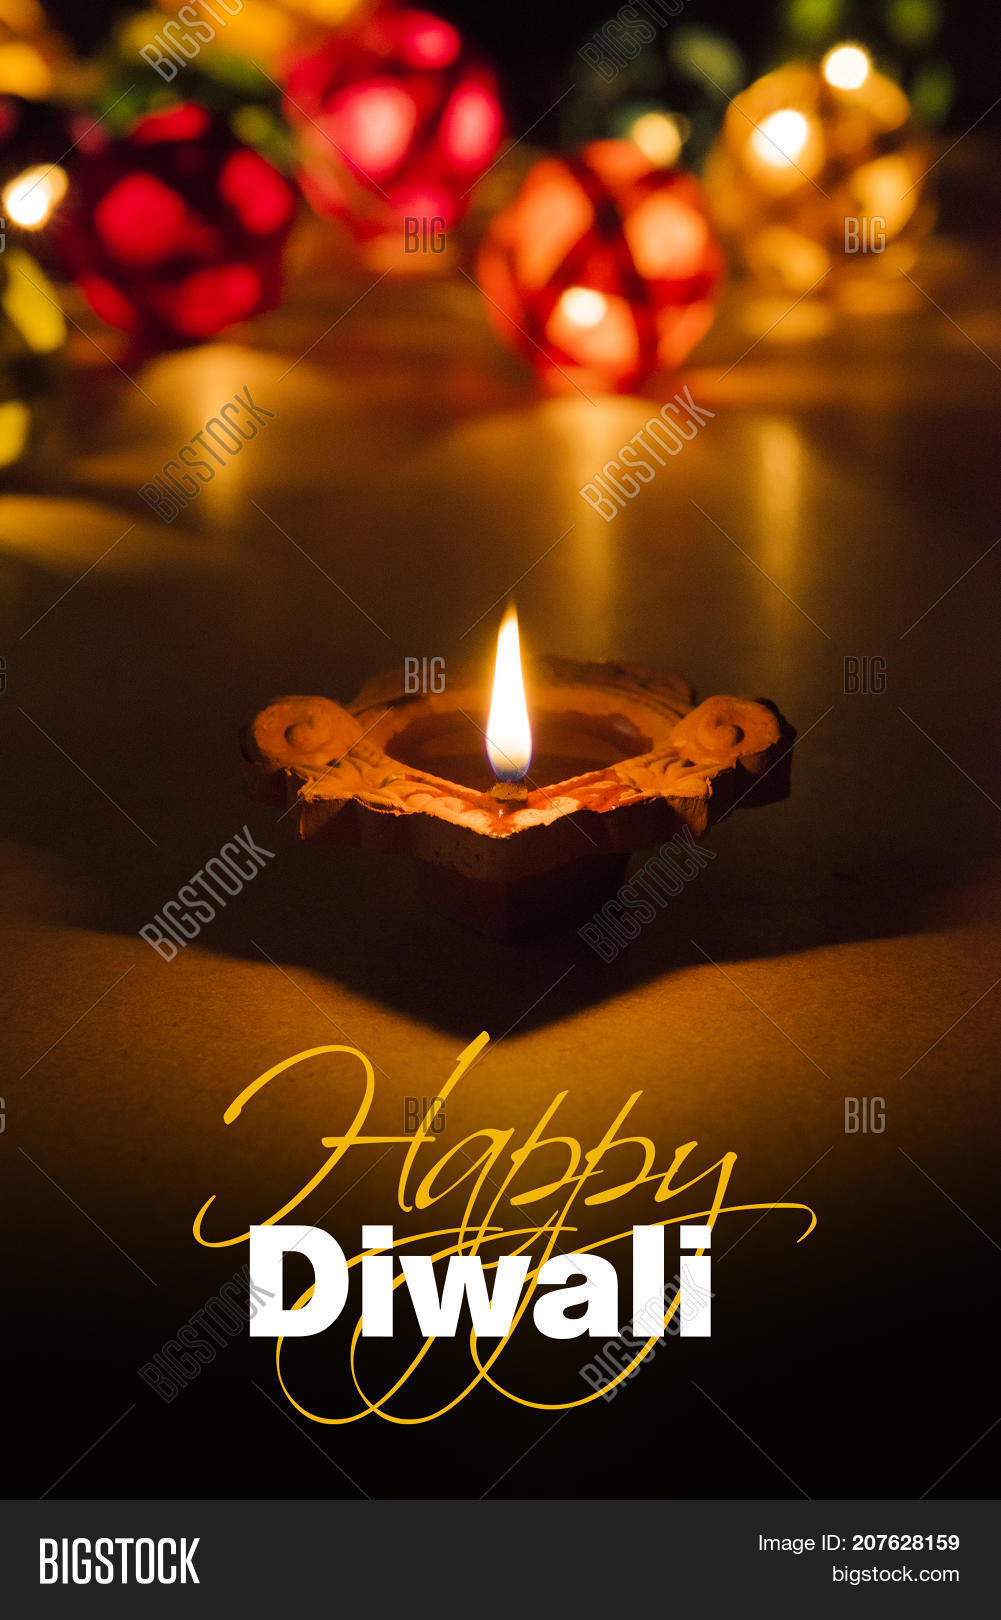 Stock Photo Diwali Image Photo Free Trial Bigstock